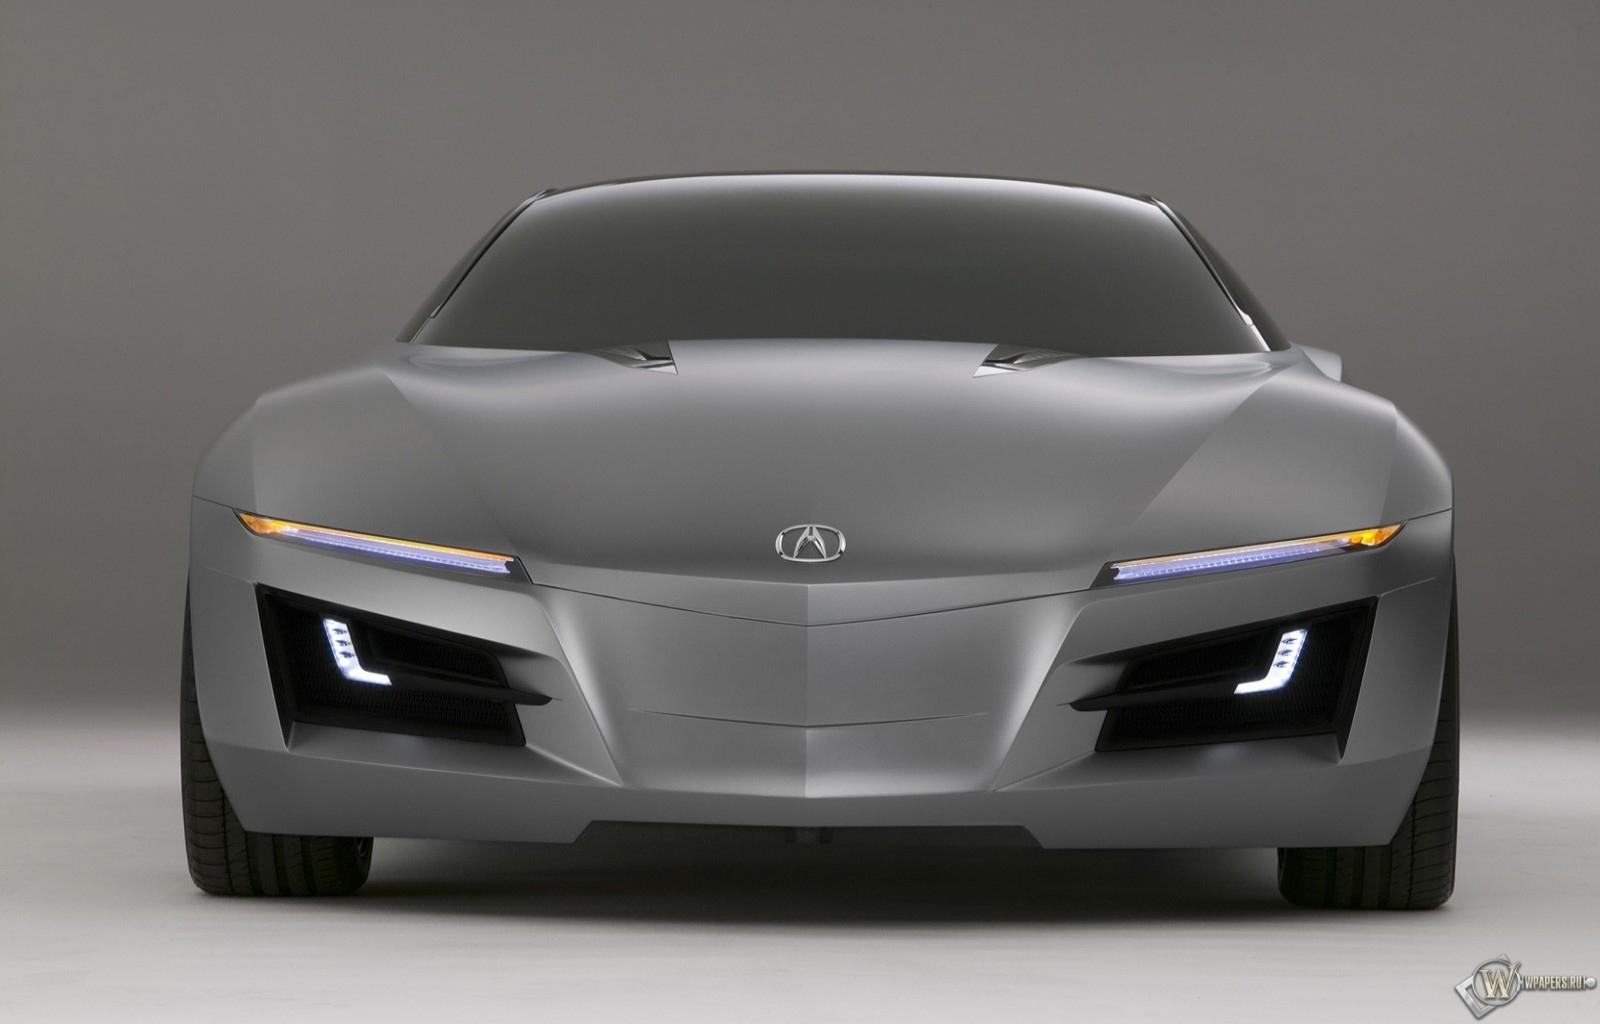 Acura Advanced Sports Car Concept (2007) 1600x1024